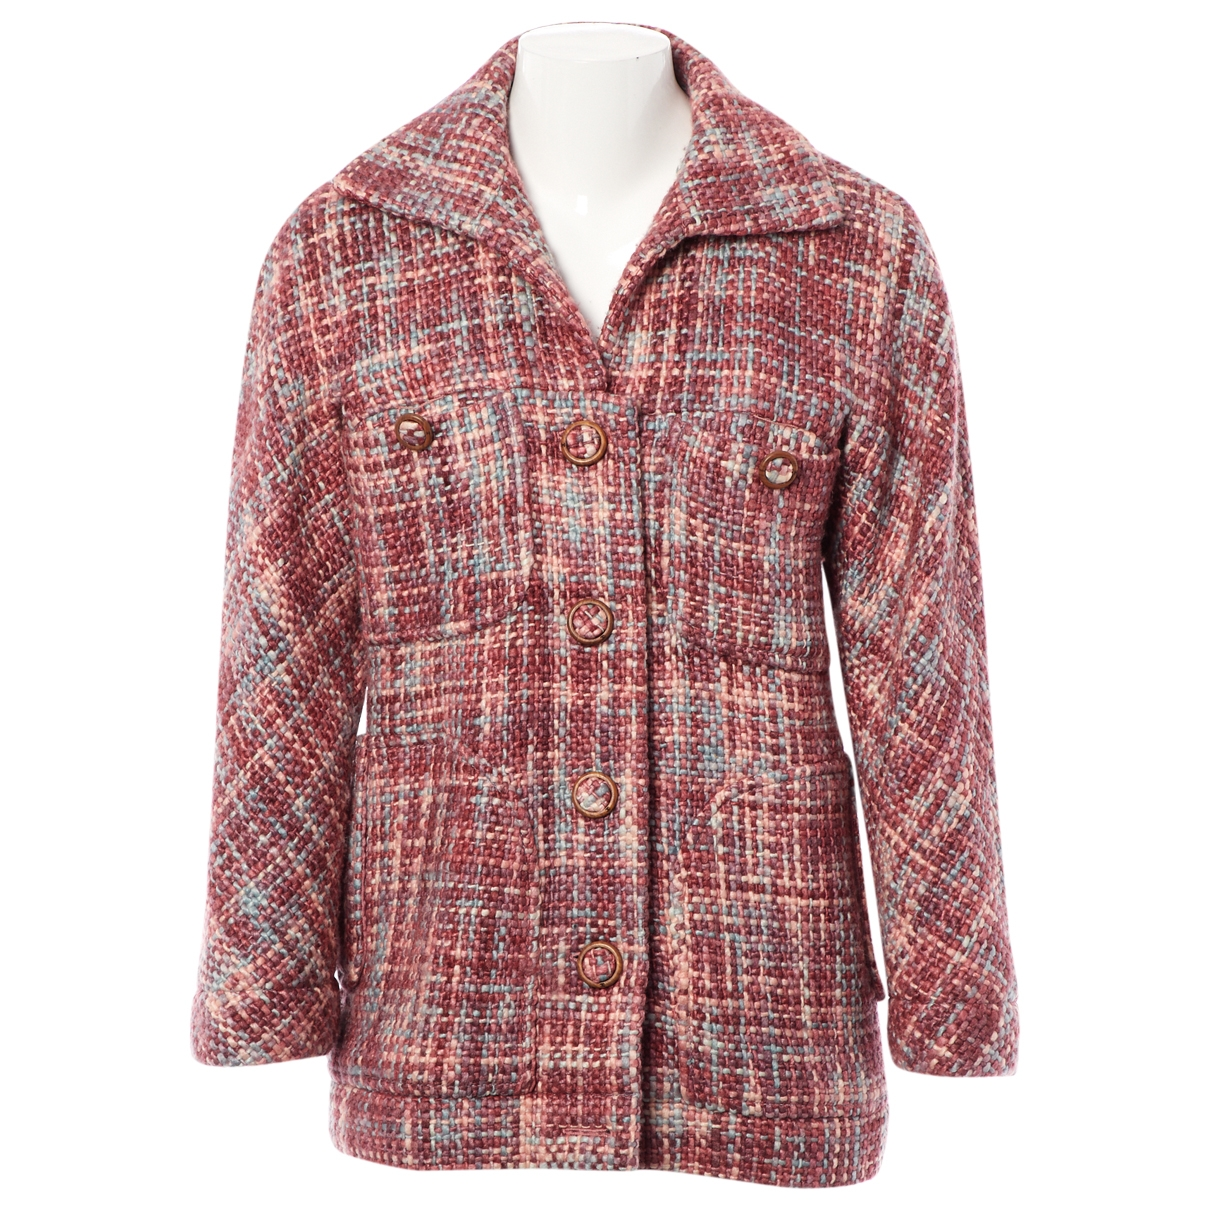 Chanel \N Pink Wool jacket for Women 38 FR